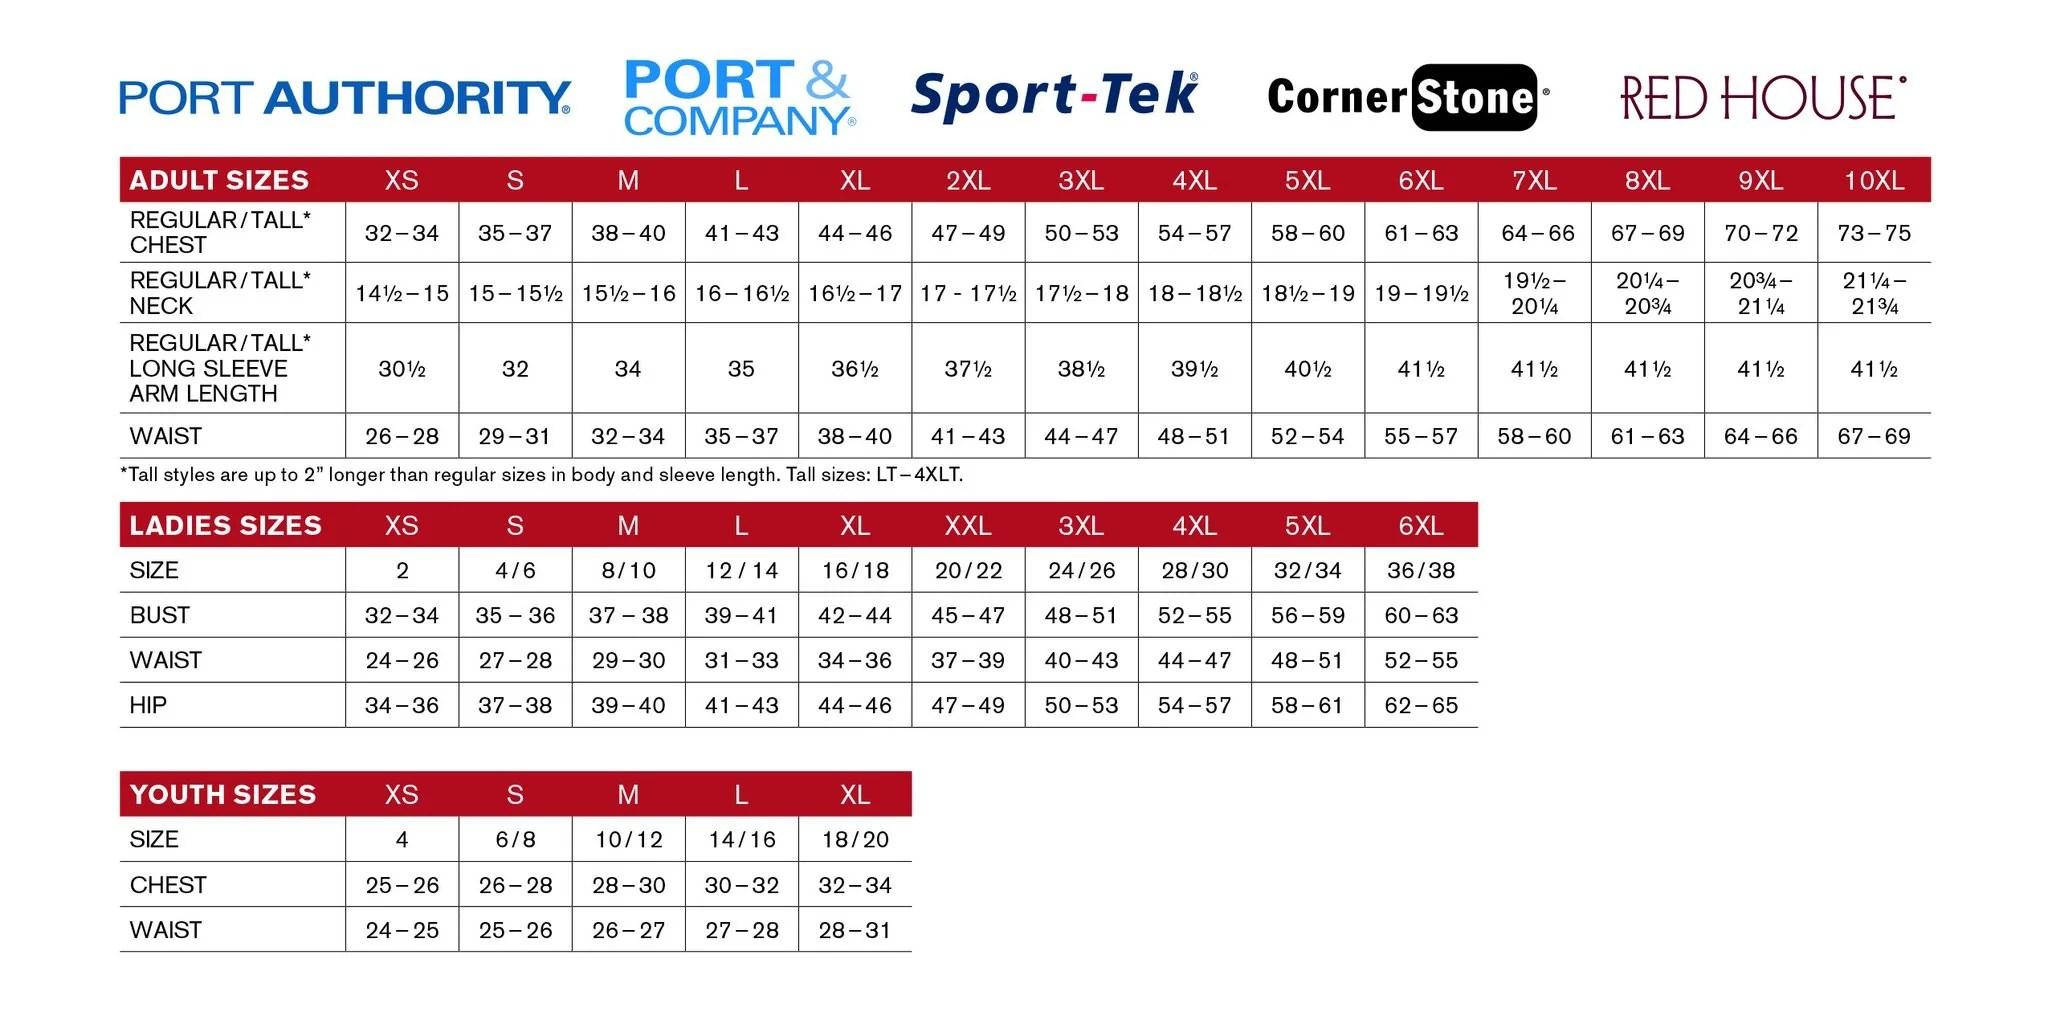 Port authority size chart also  world water works wear by tailored rh worldwaterworkswear